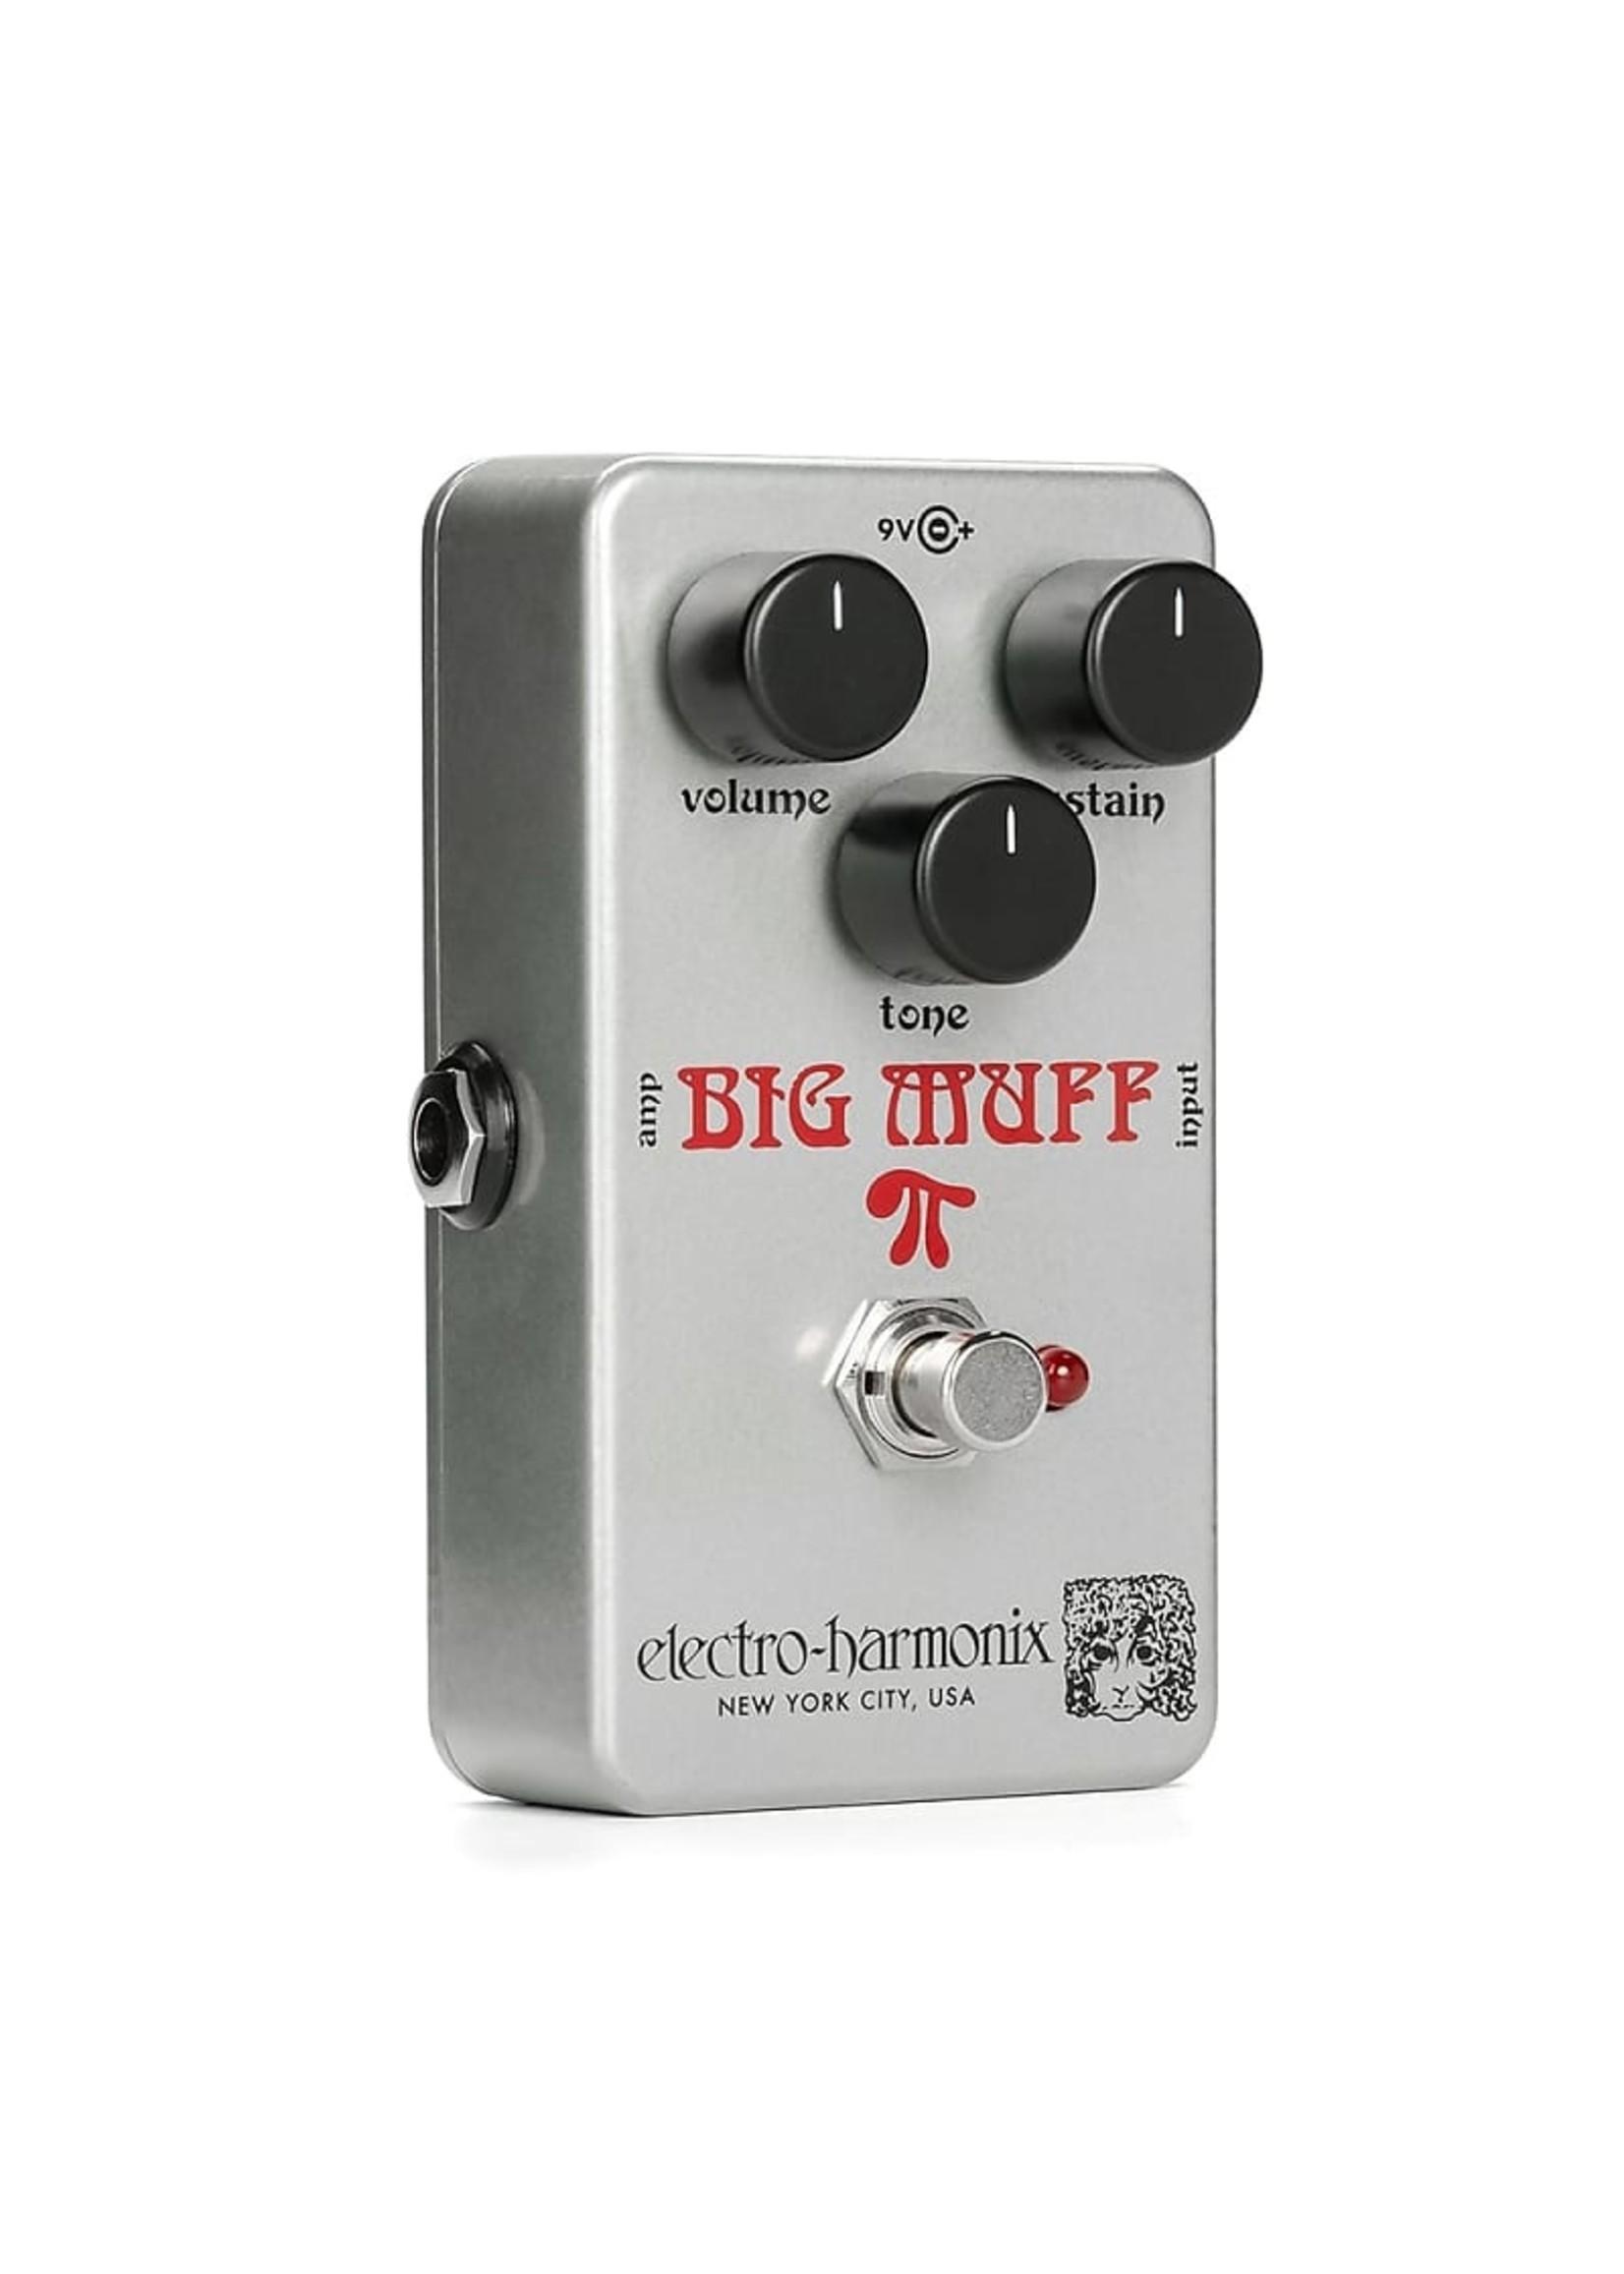 Electro-Harmonix Electro-Harmonix Ram's Head Big Muff Pi Fuzz Pedal